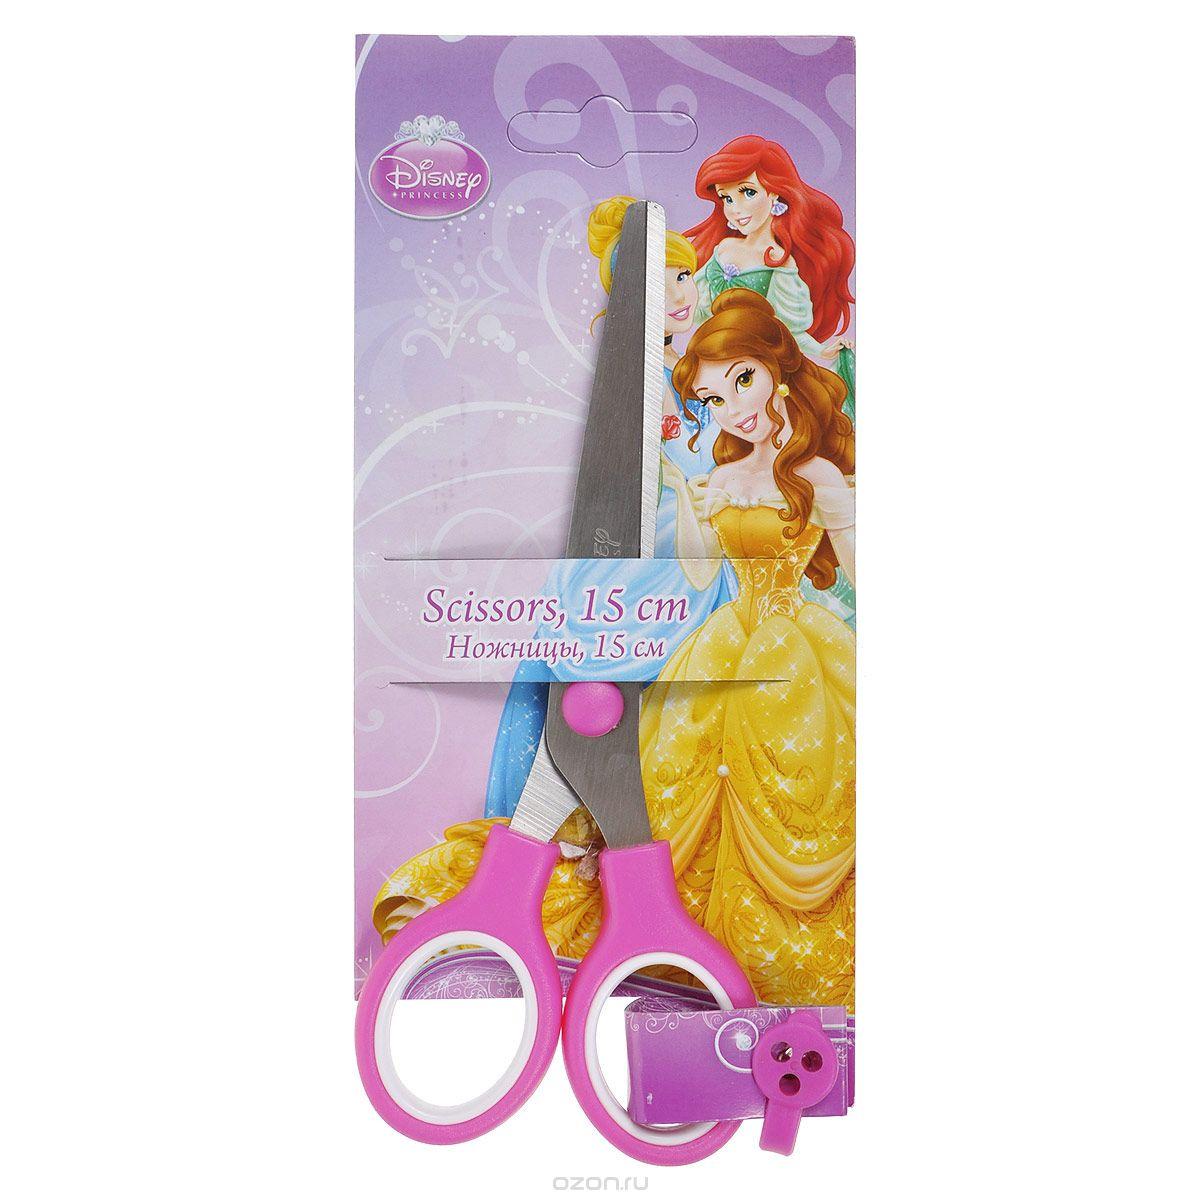 Ножницы дет 150мм Принцесса PRBB-US1-SC15-BL1